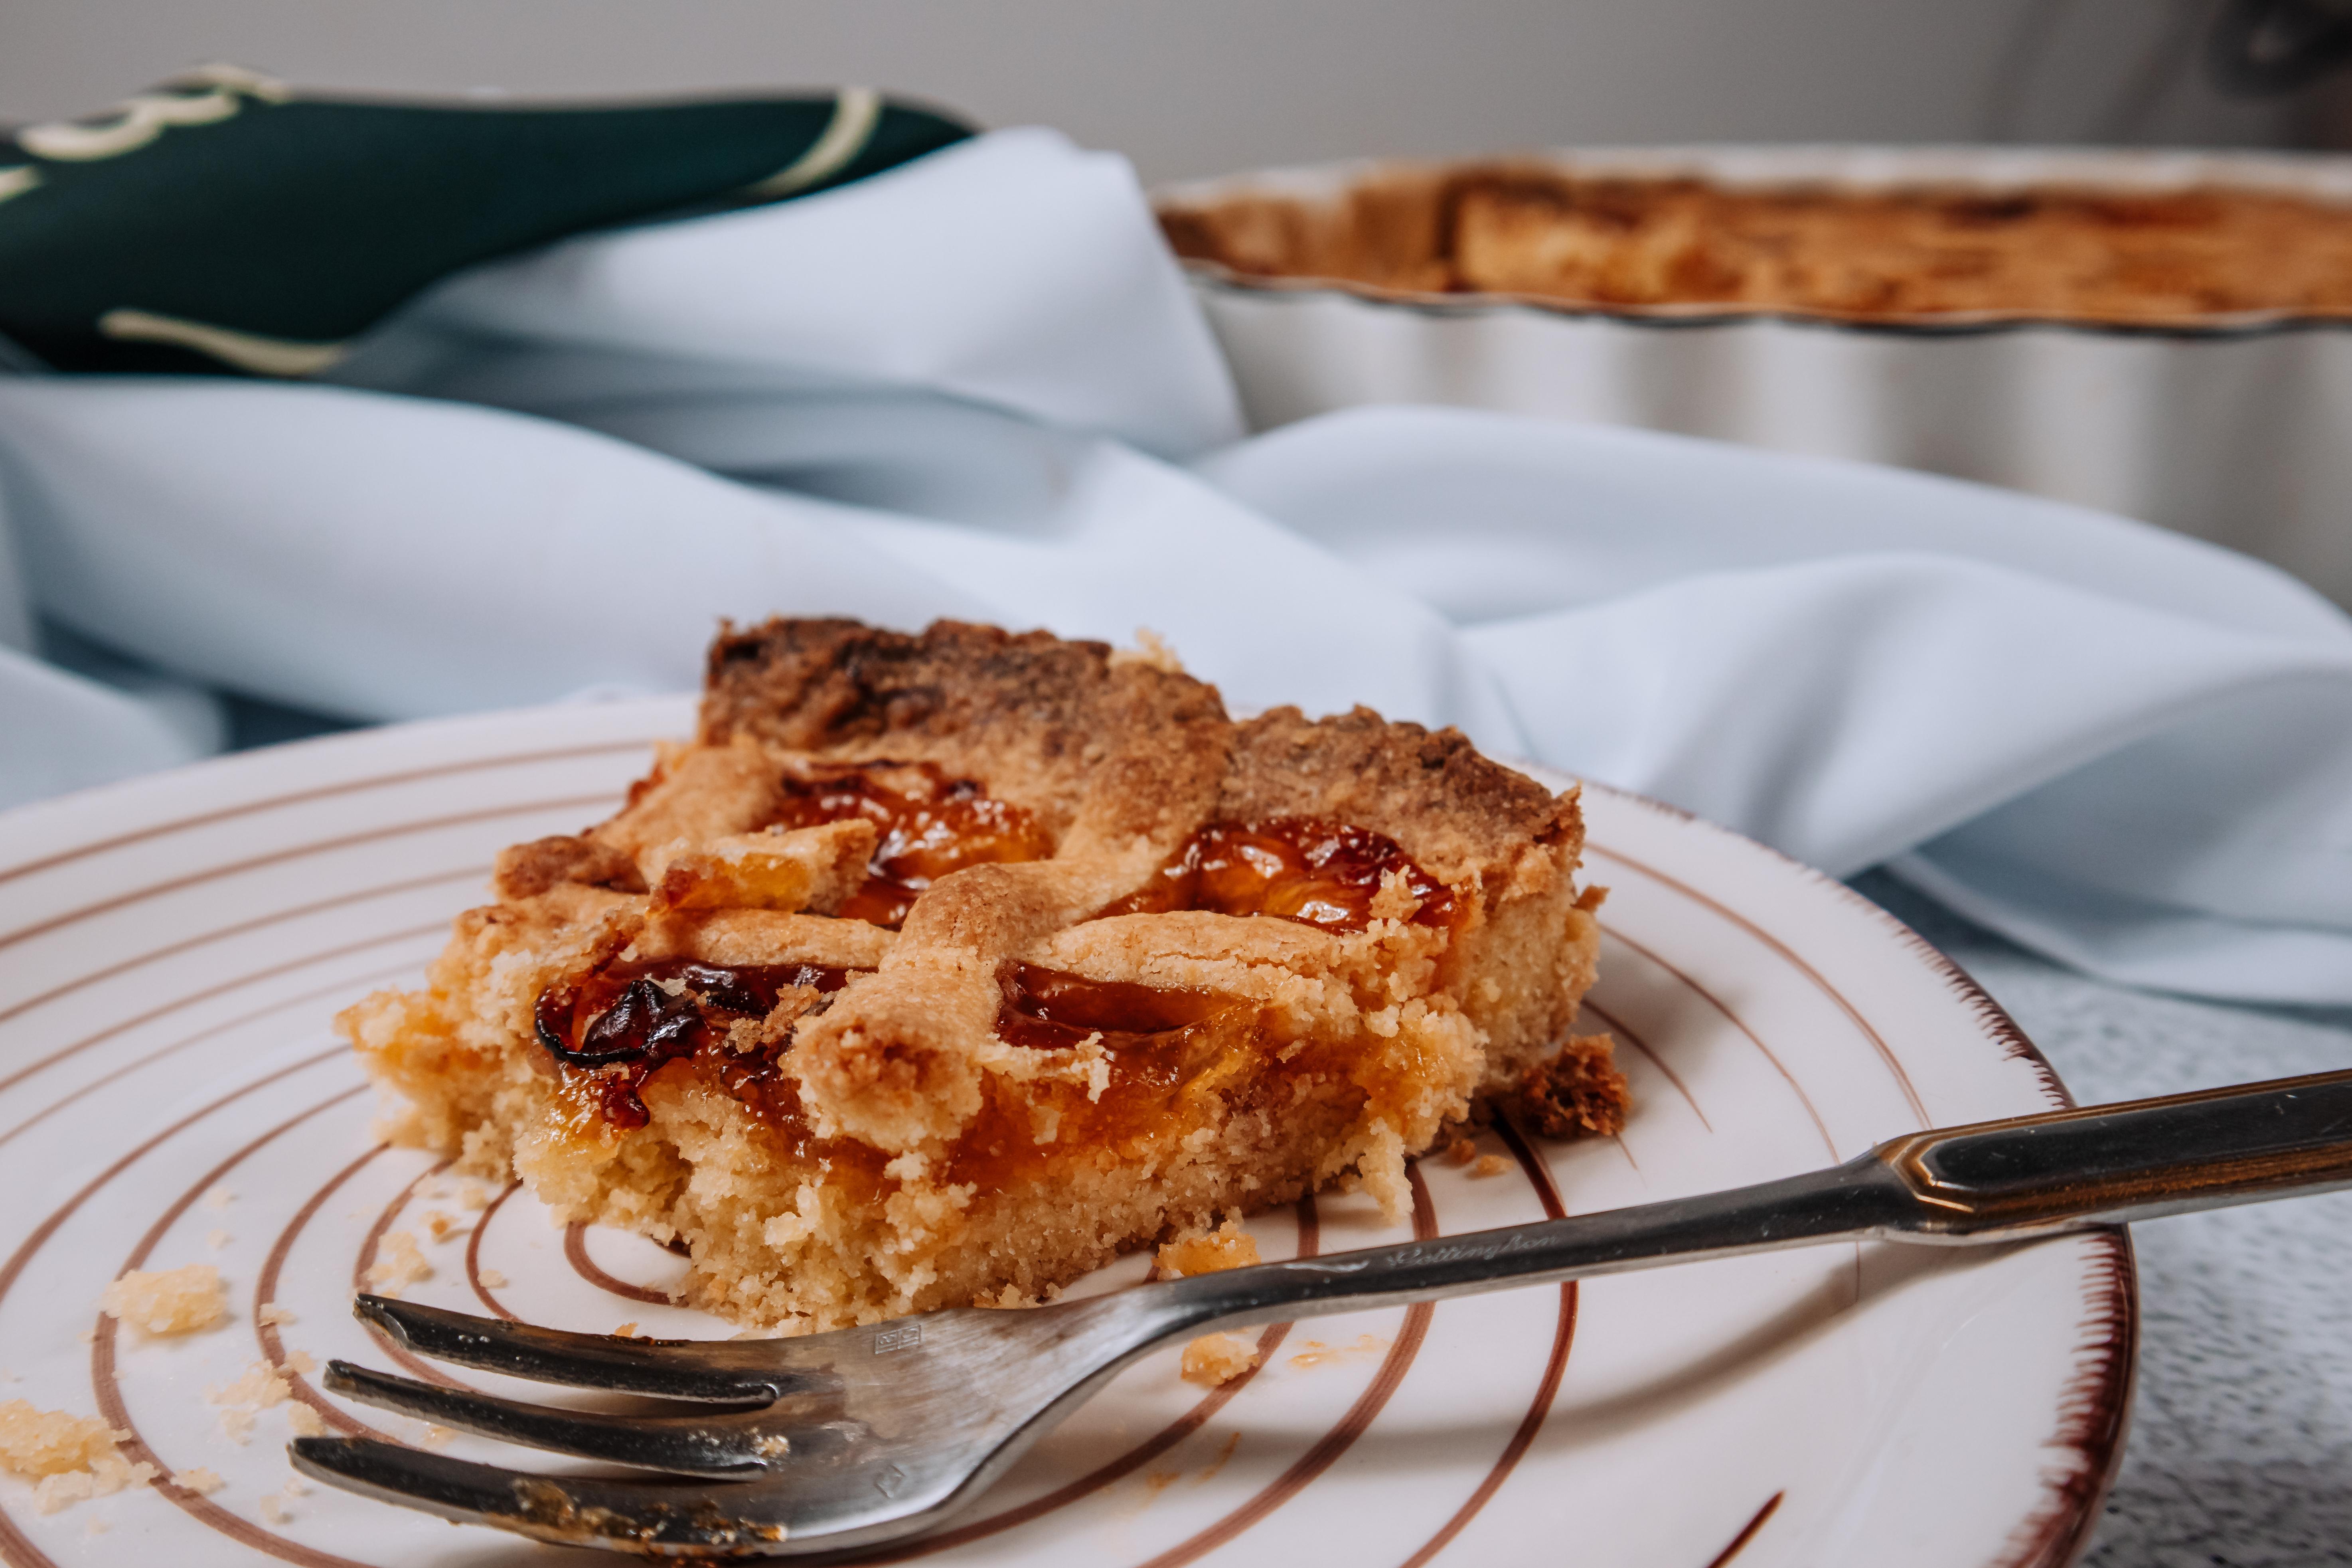 jam-tart-howto-cook-recipe-dessert-foodblog